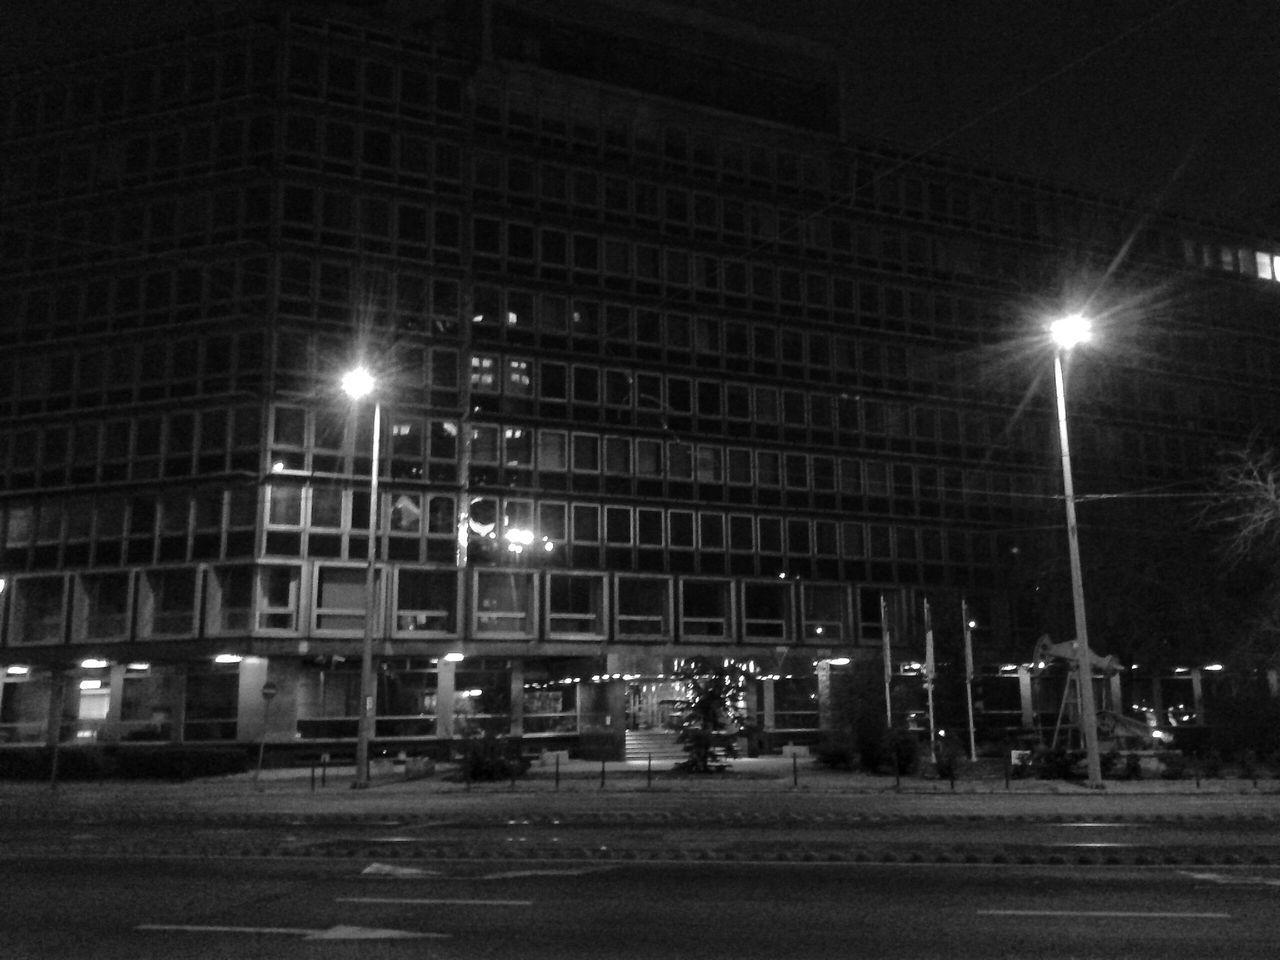 Streetphotography Streetphoto_bw Blackandwhite Bnw_friday_challenge